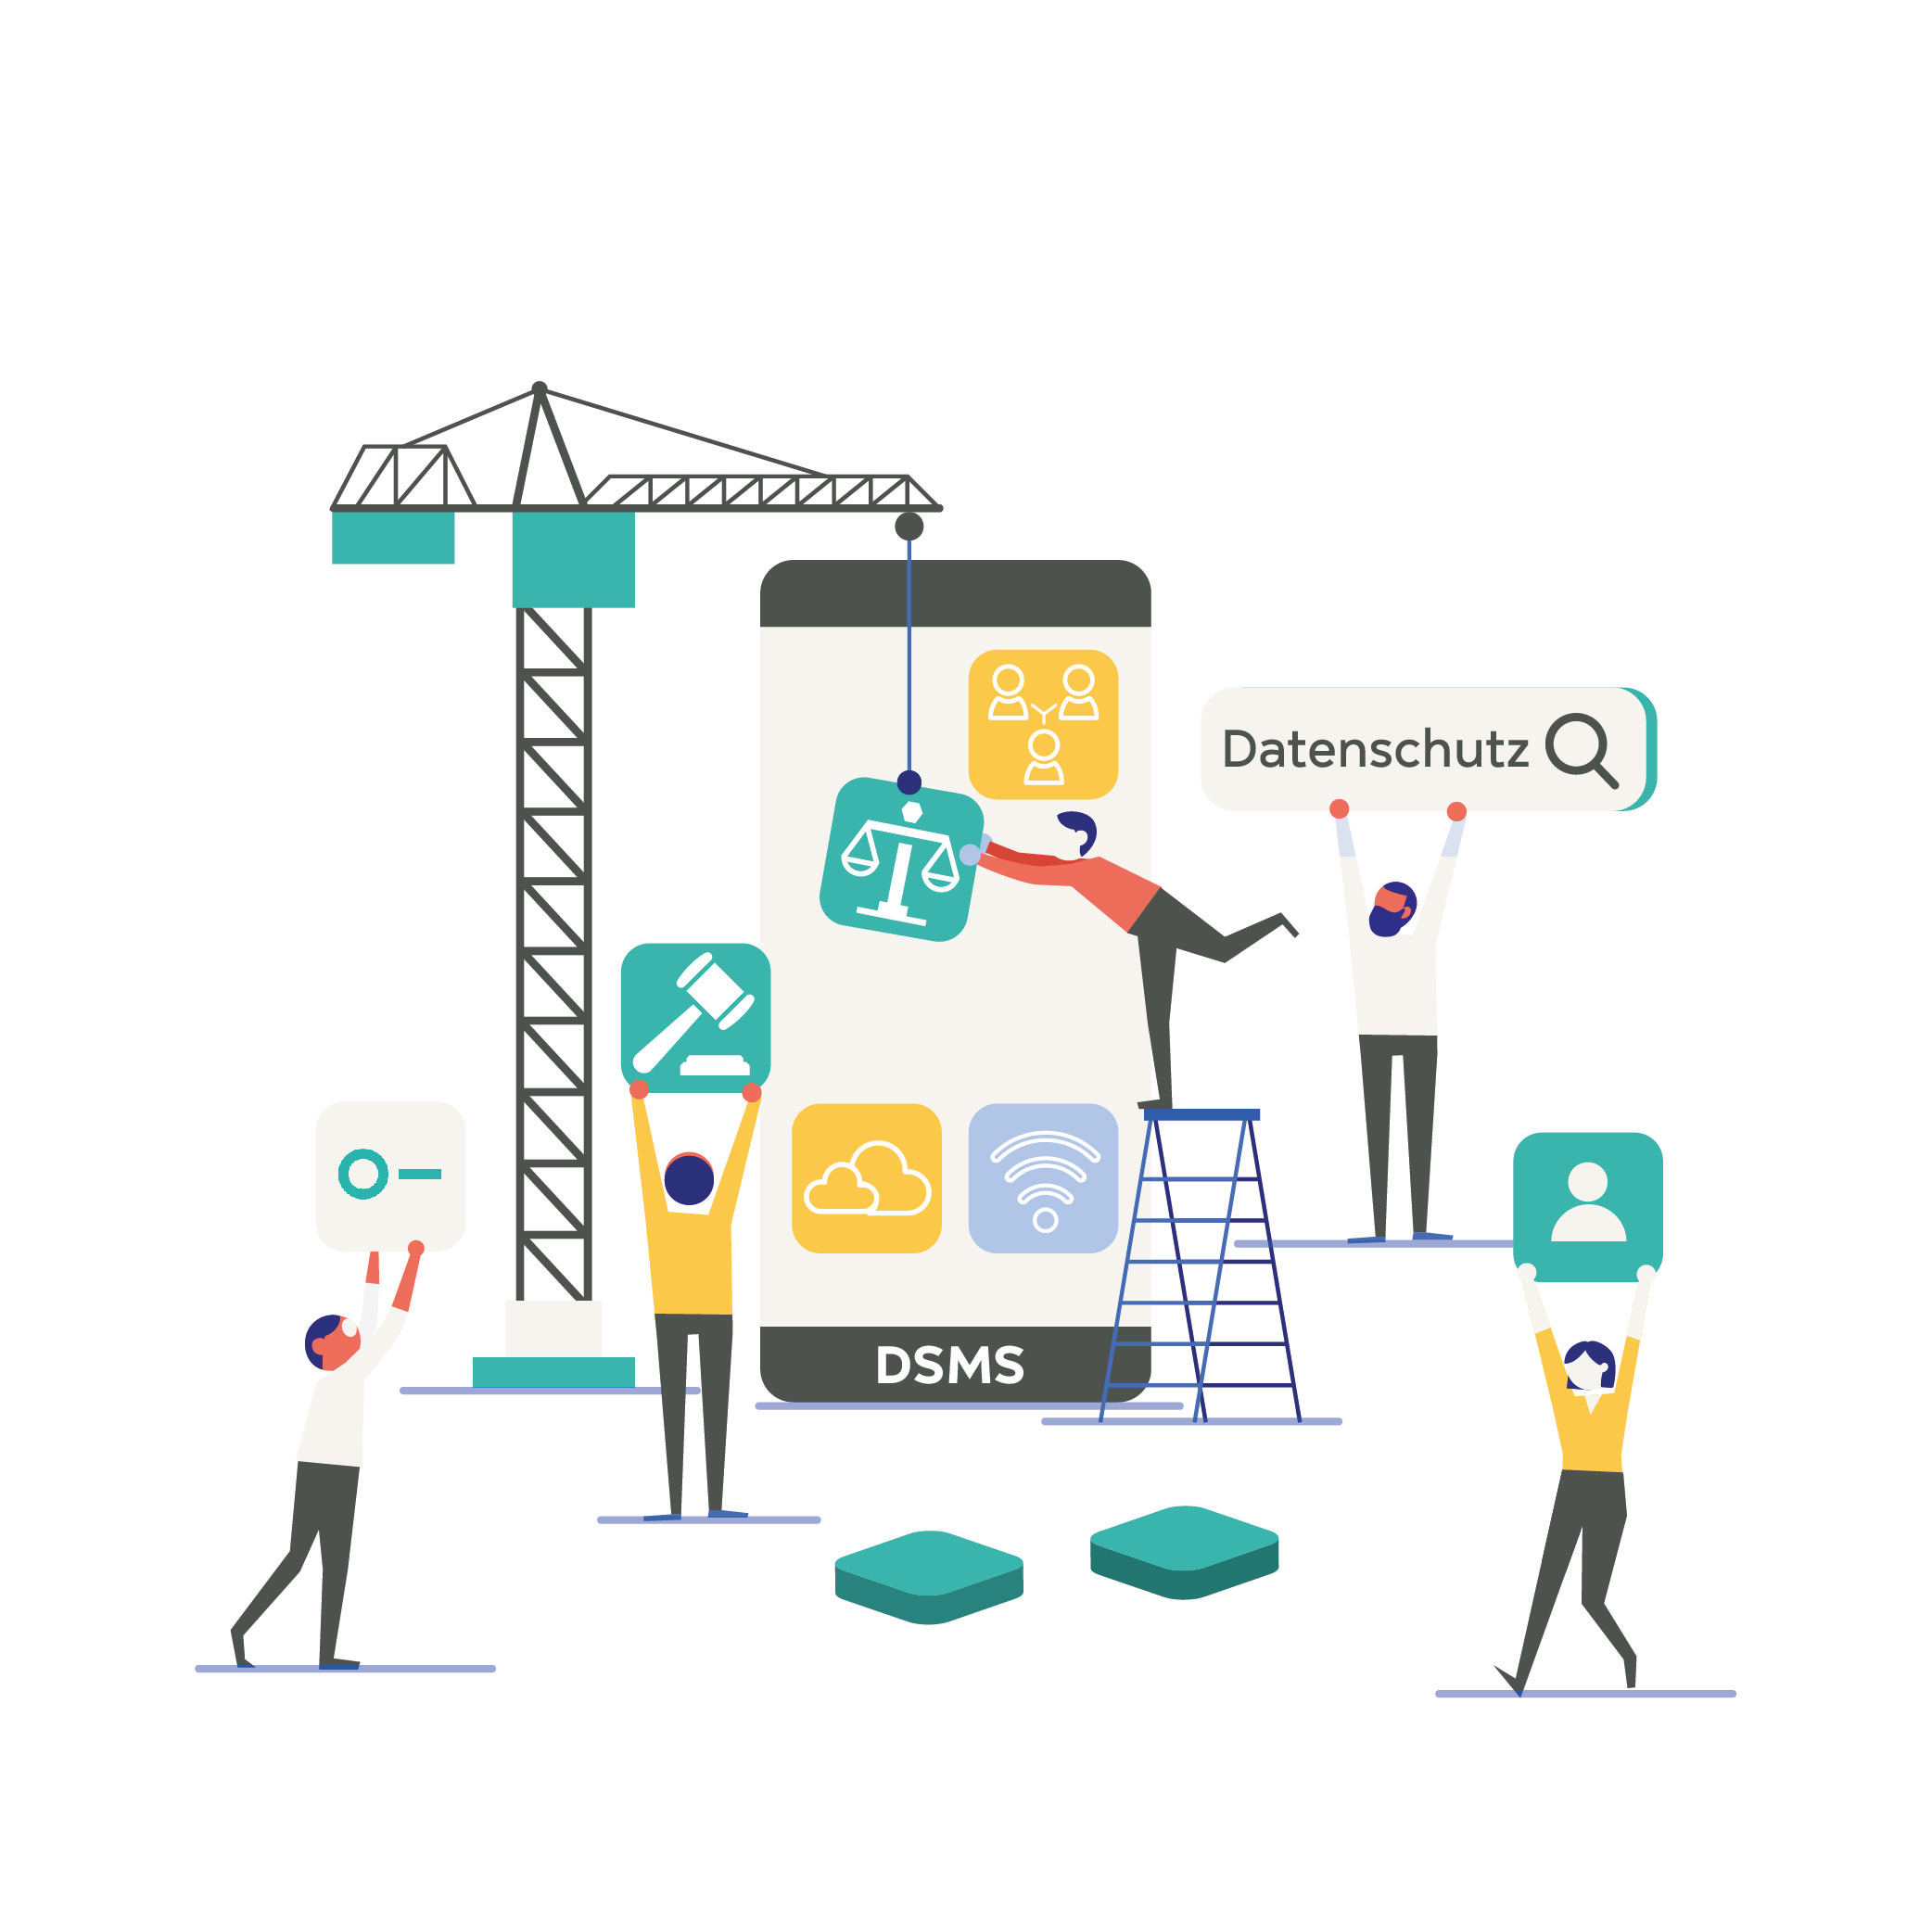 Datenschutz-Management-System